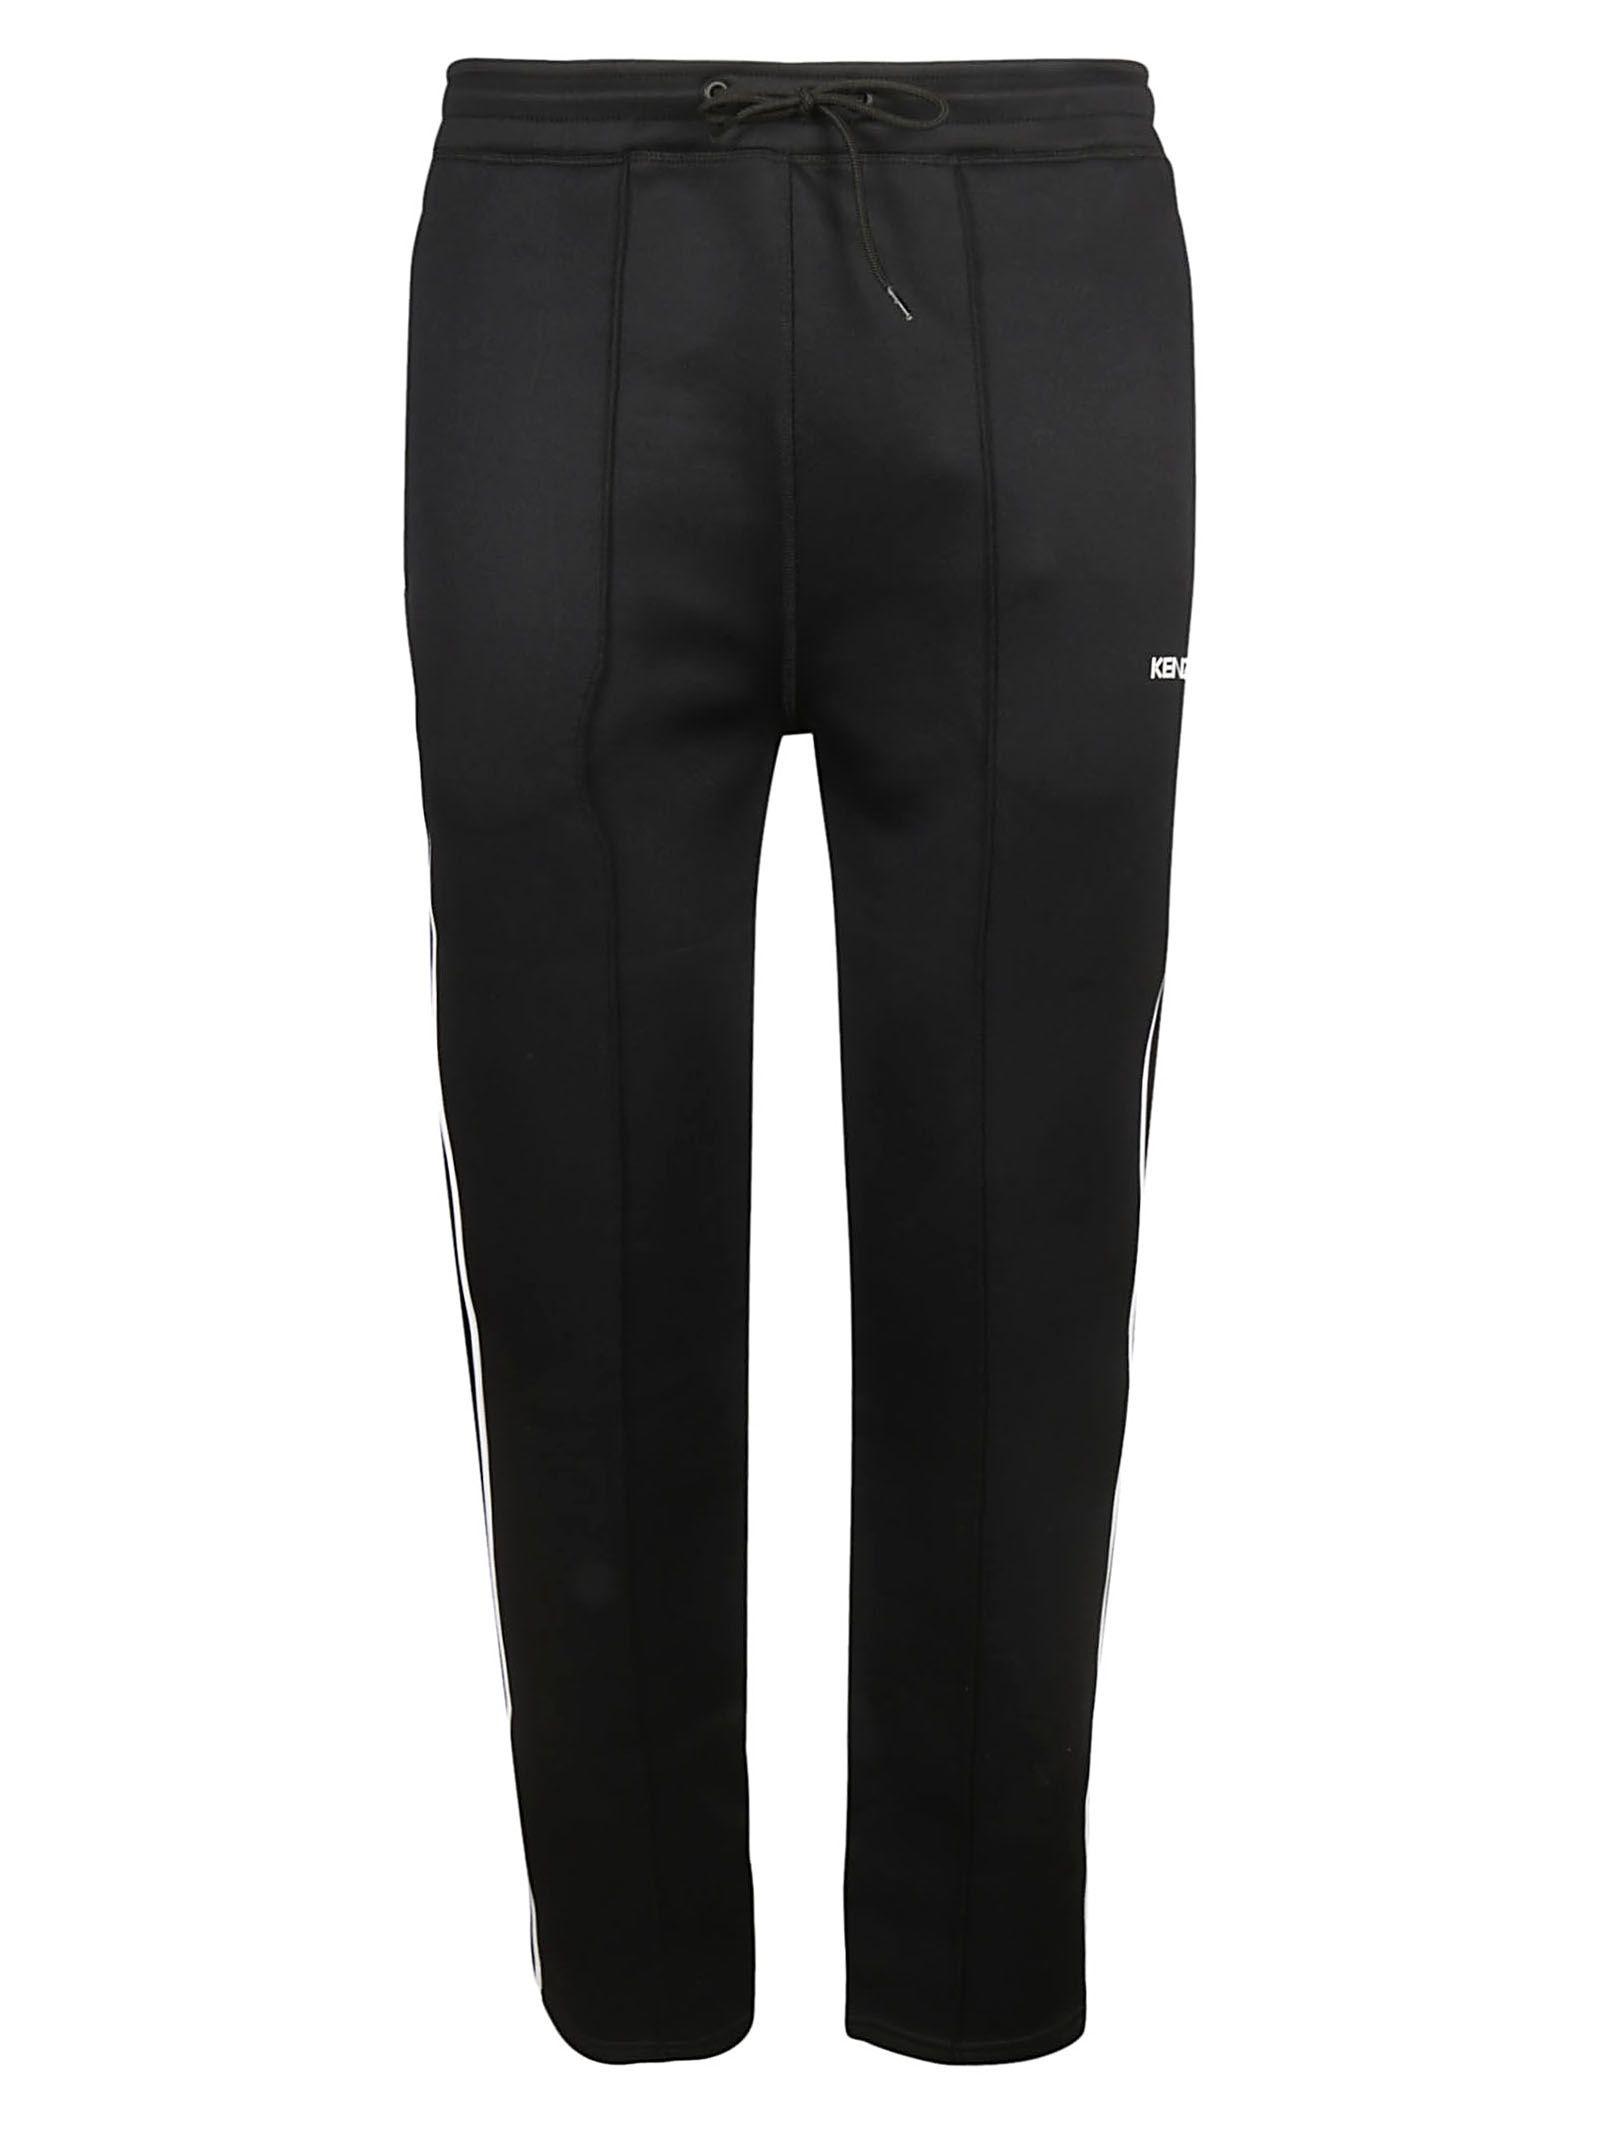 Kenzo Drawstring Sweatpants